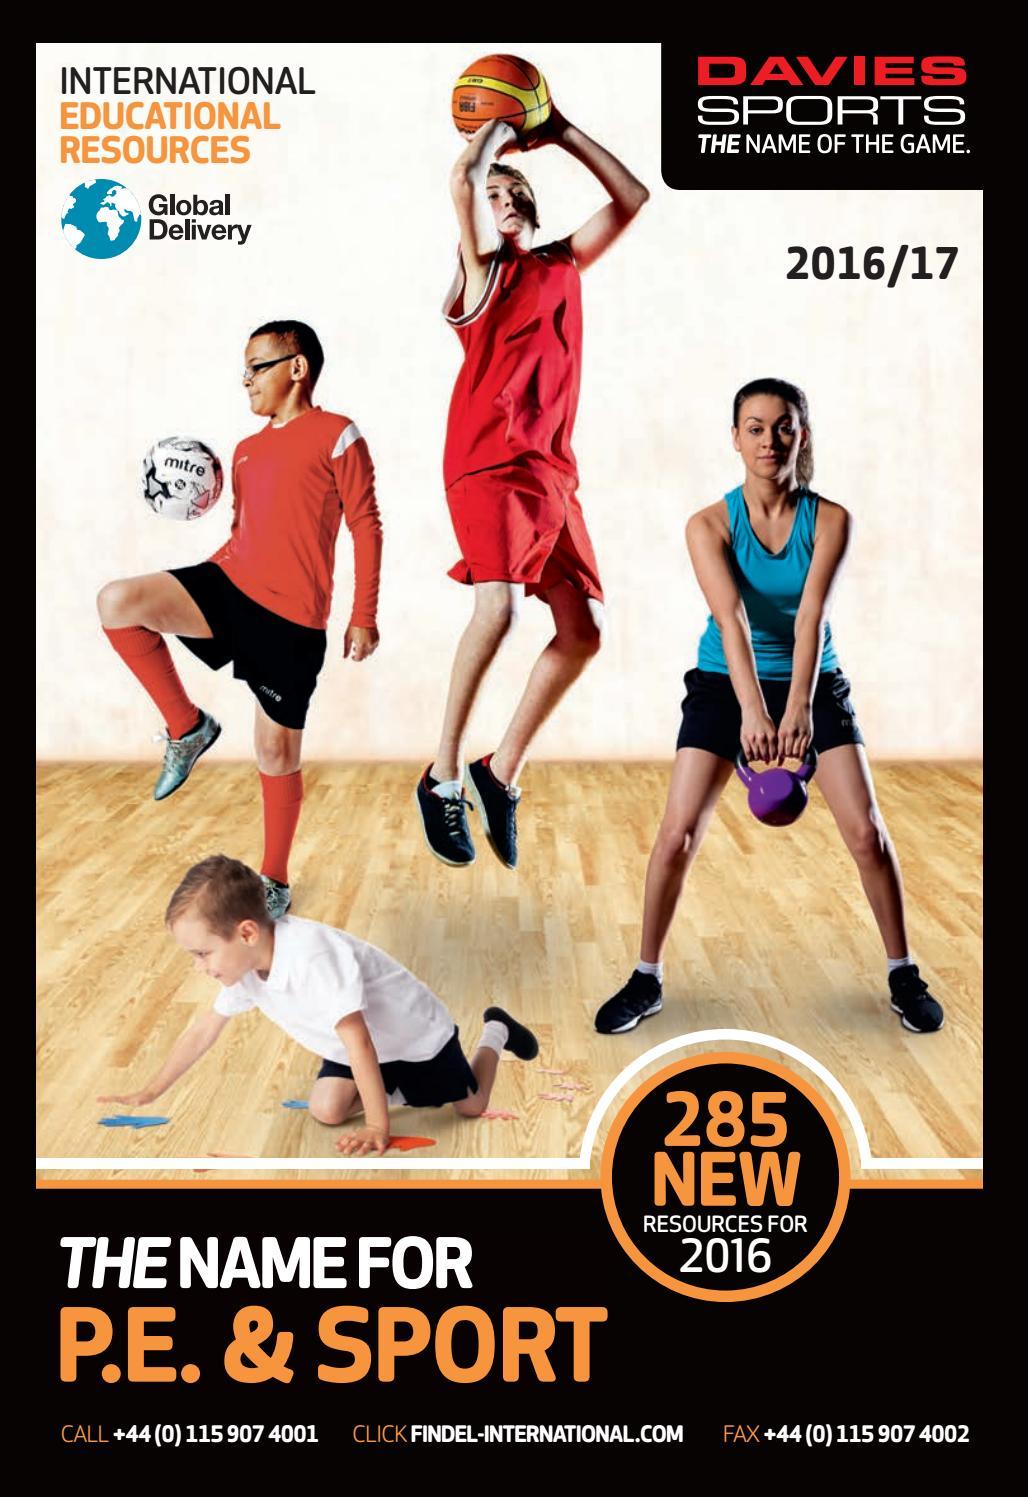 Davies Sports International Catalogue 2016 17 By Findel Ltd Issuu Asian Games 2018 Ball Bhin 13cm